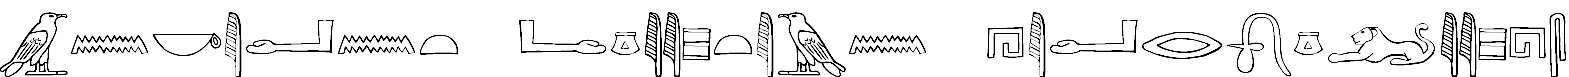 AncientEgyptianHieroglyphs